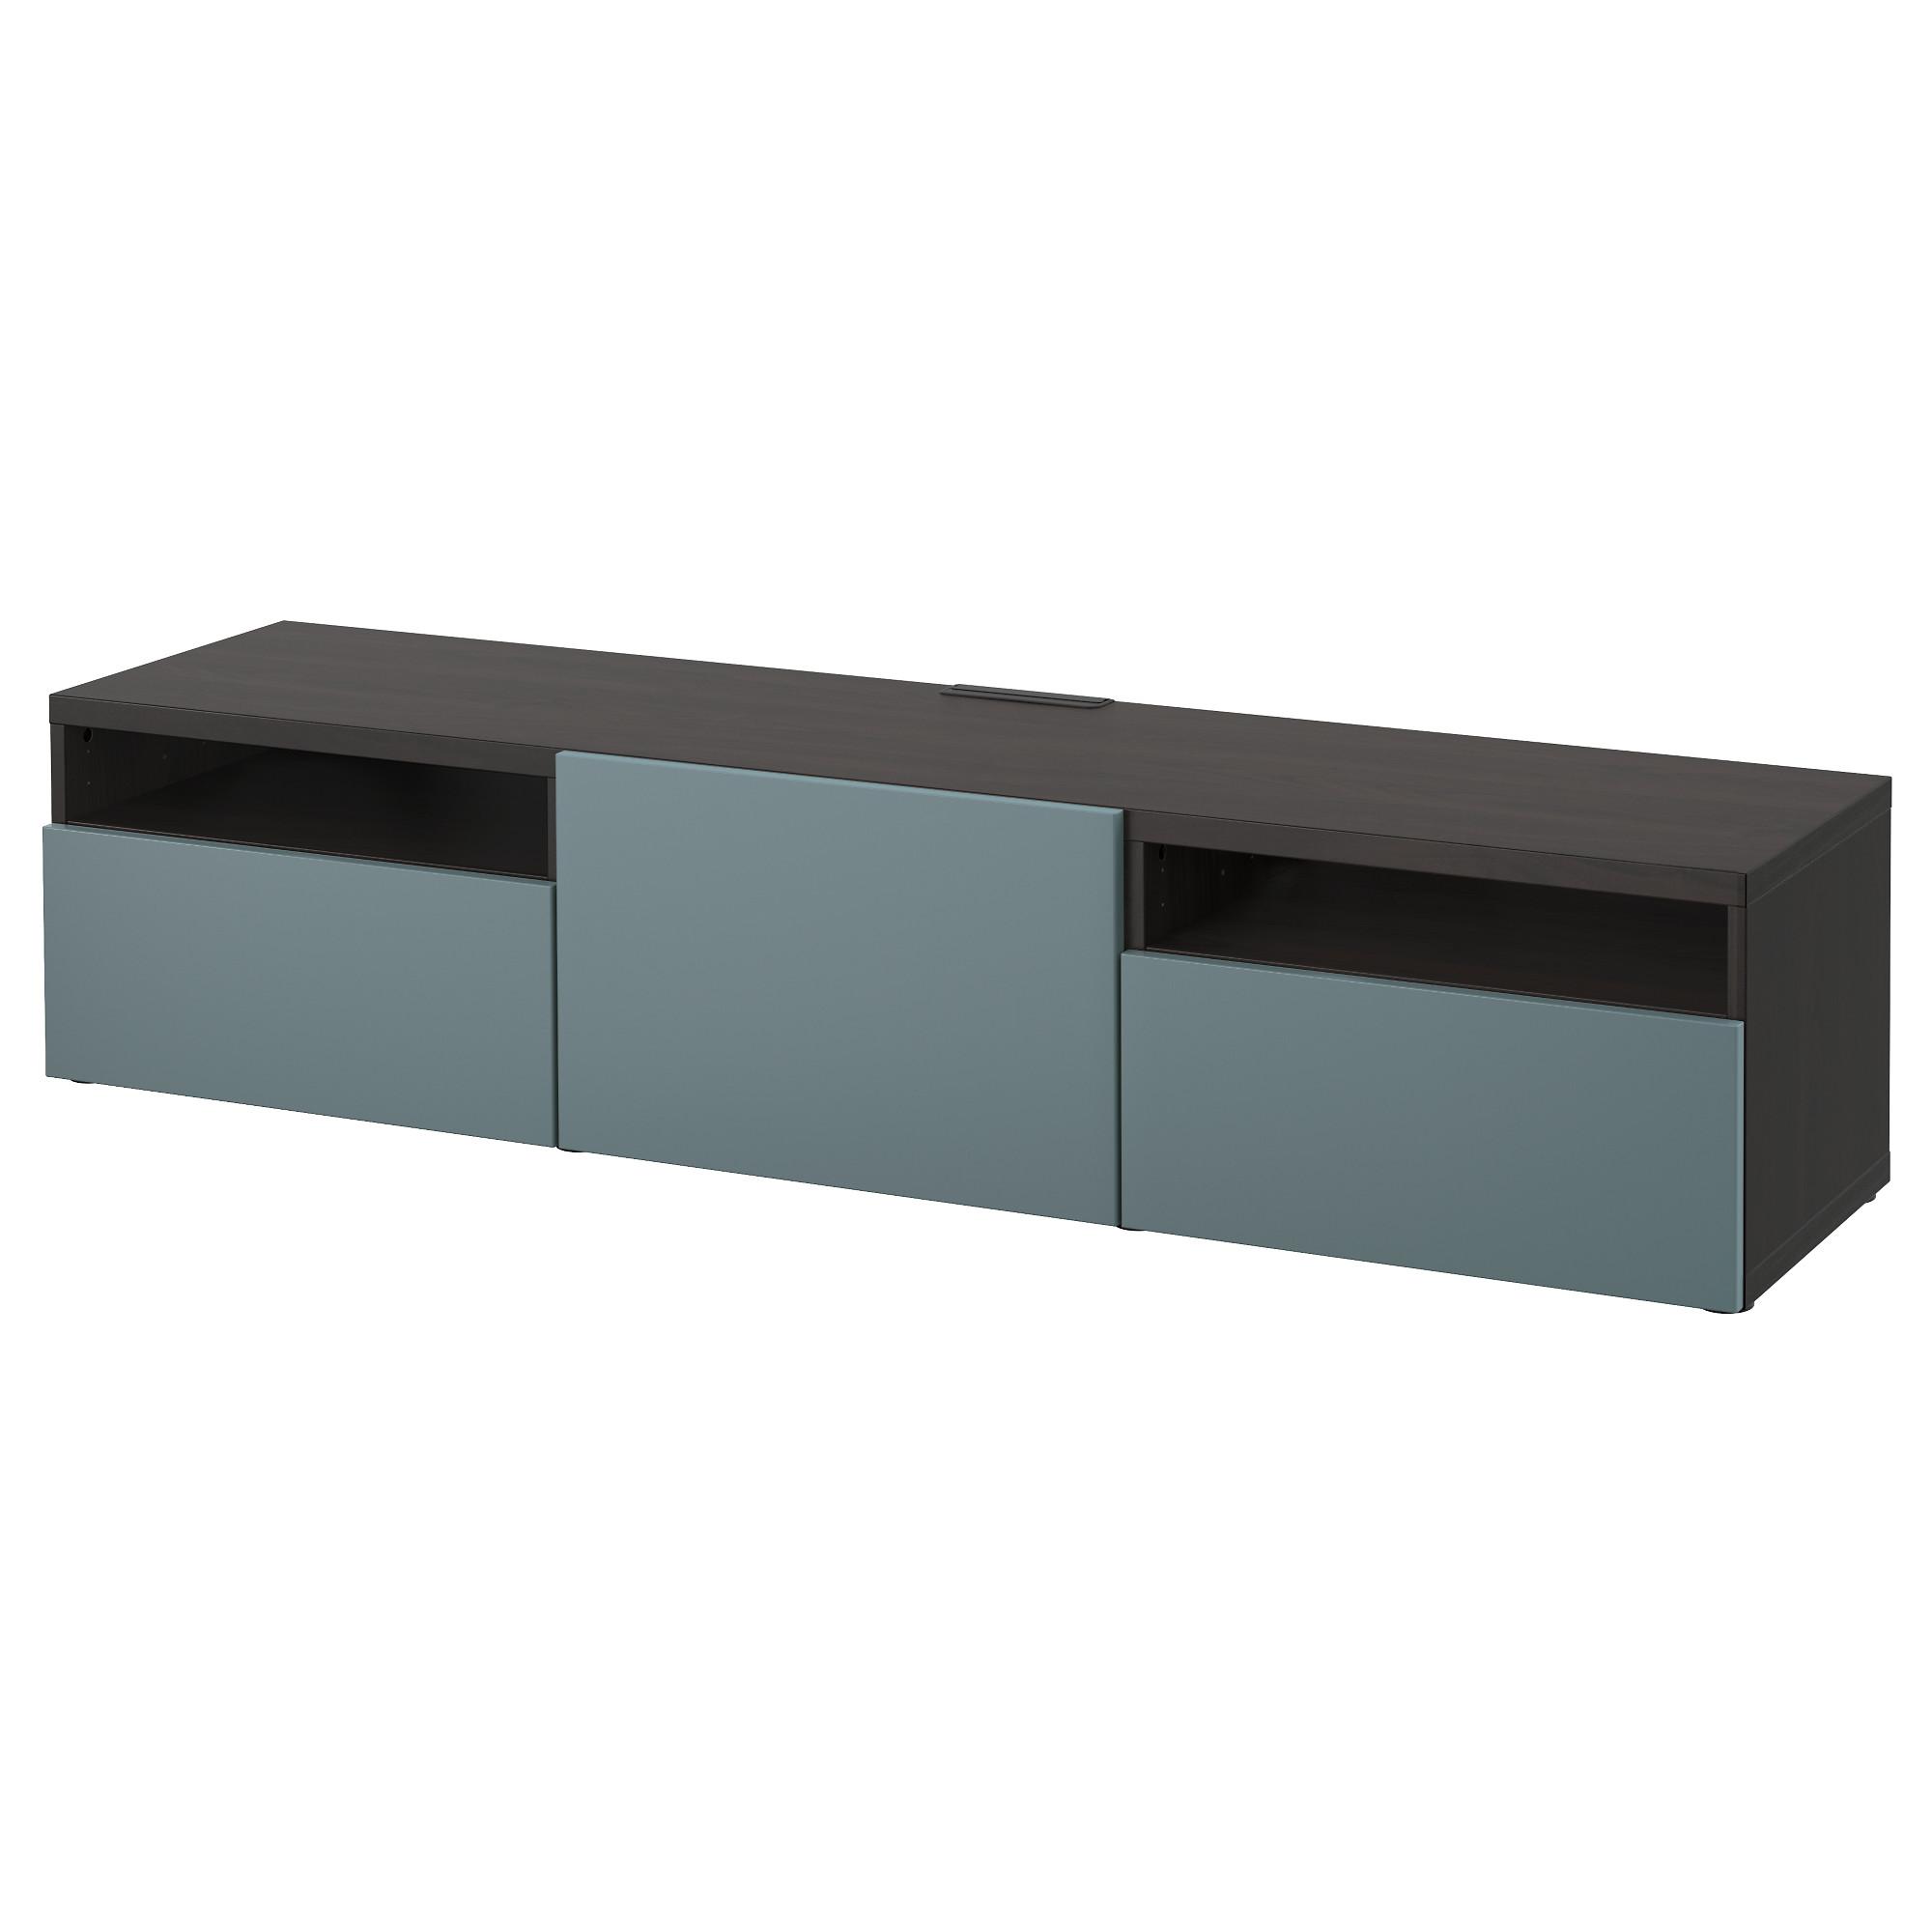 Тумба под ТВ БЕСТО артикуль № 392.503.52 в наличии. Online каталог IKEA РБ. Недорогая доставка и установка.